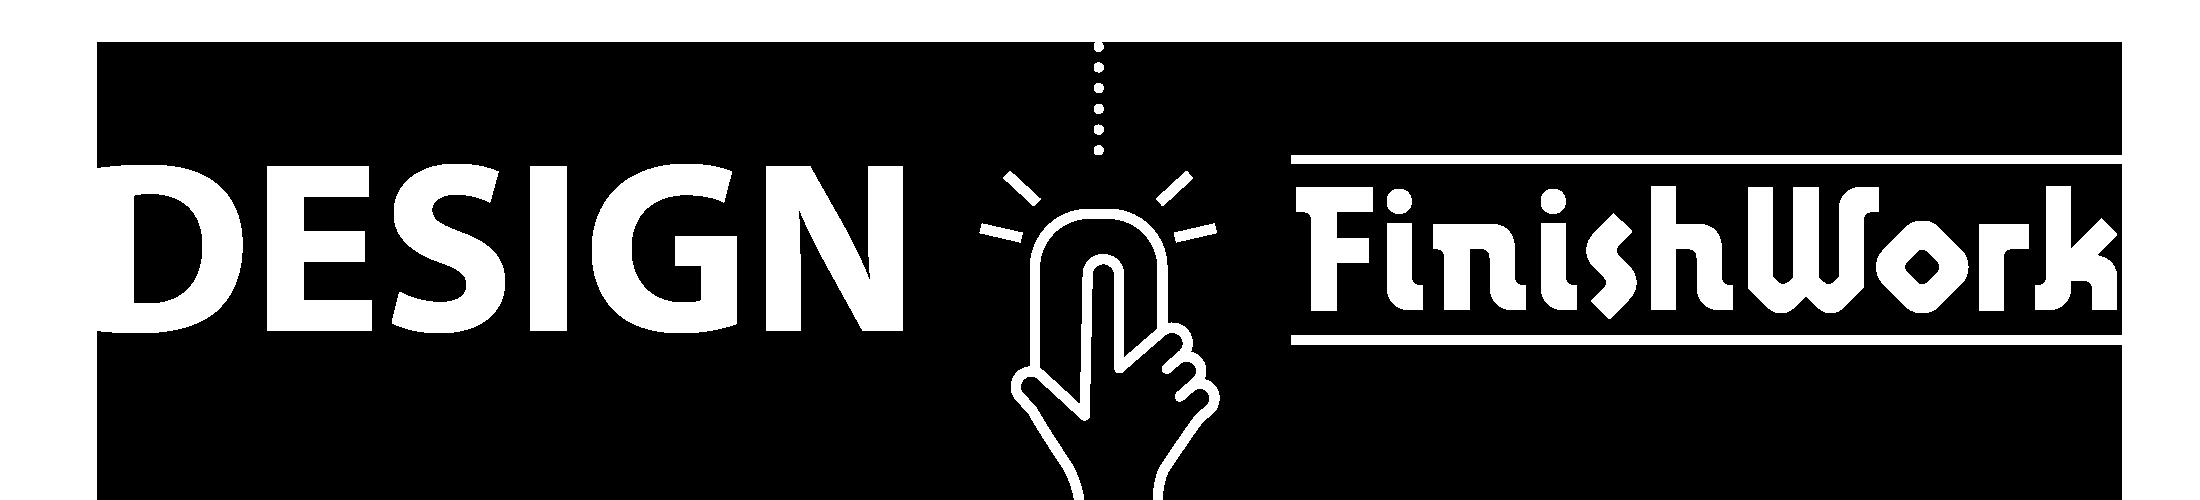 FinishWork